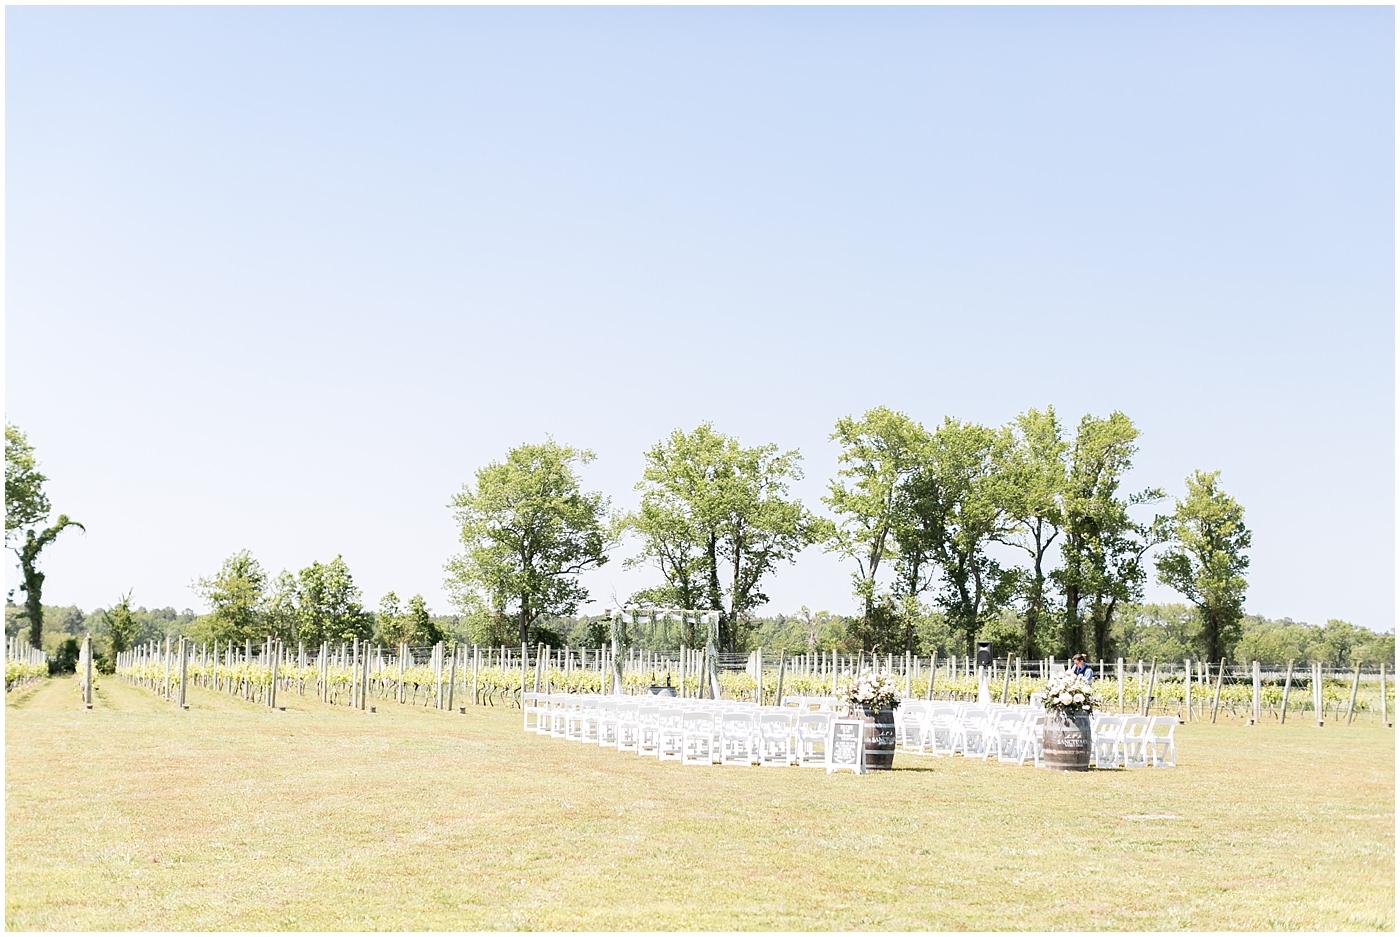 sanctuary vineyards wedding jessica ryan photography, winery wedding